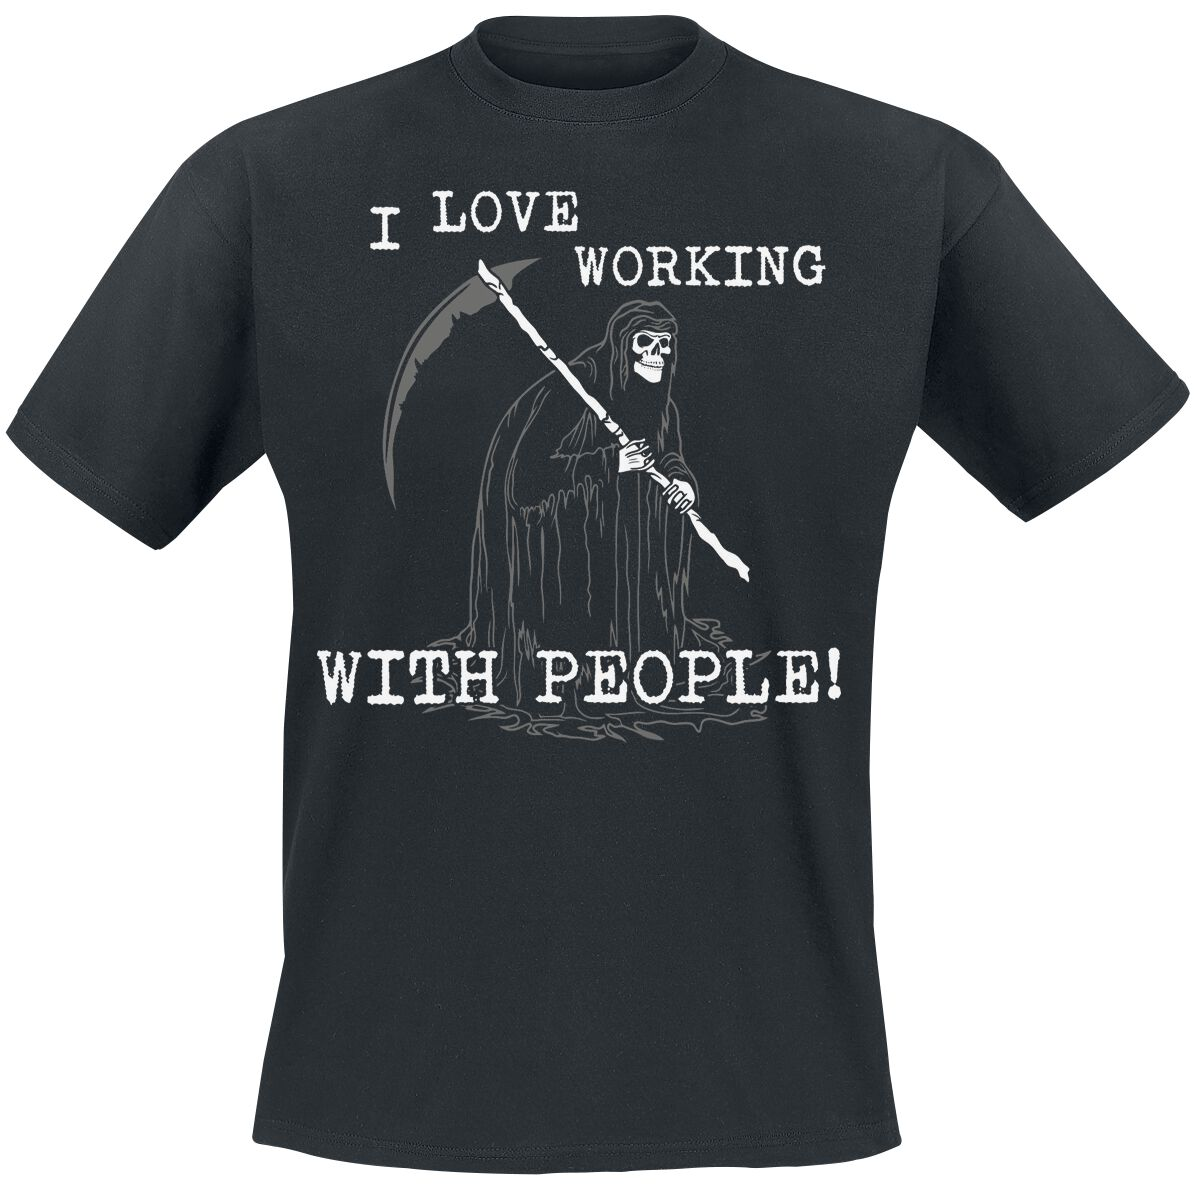 Fun Shirts - Koszulki - T-Shirt I Love Working With People T-Shirt czarny - 345263